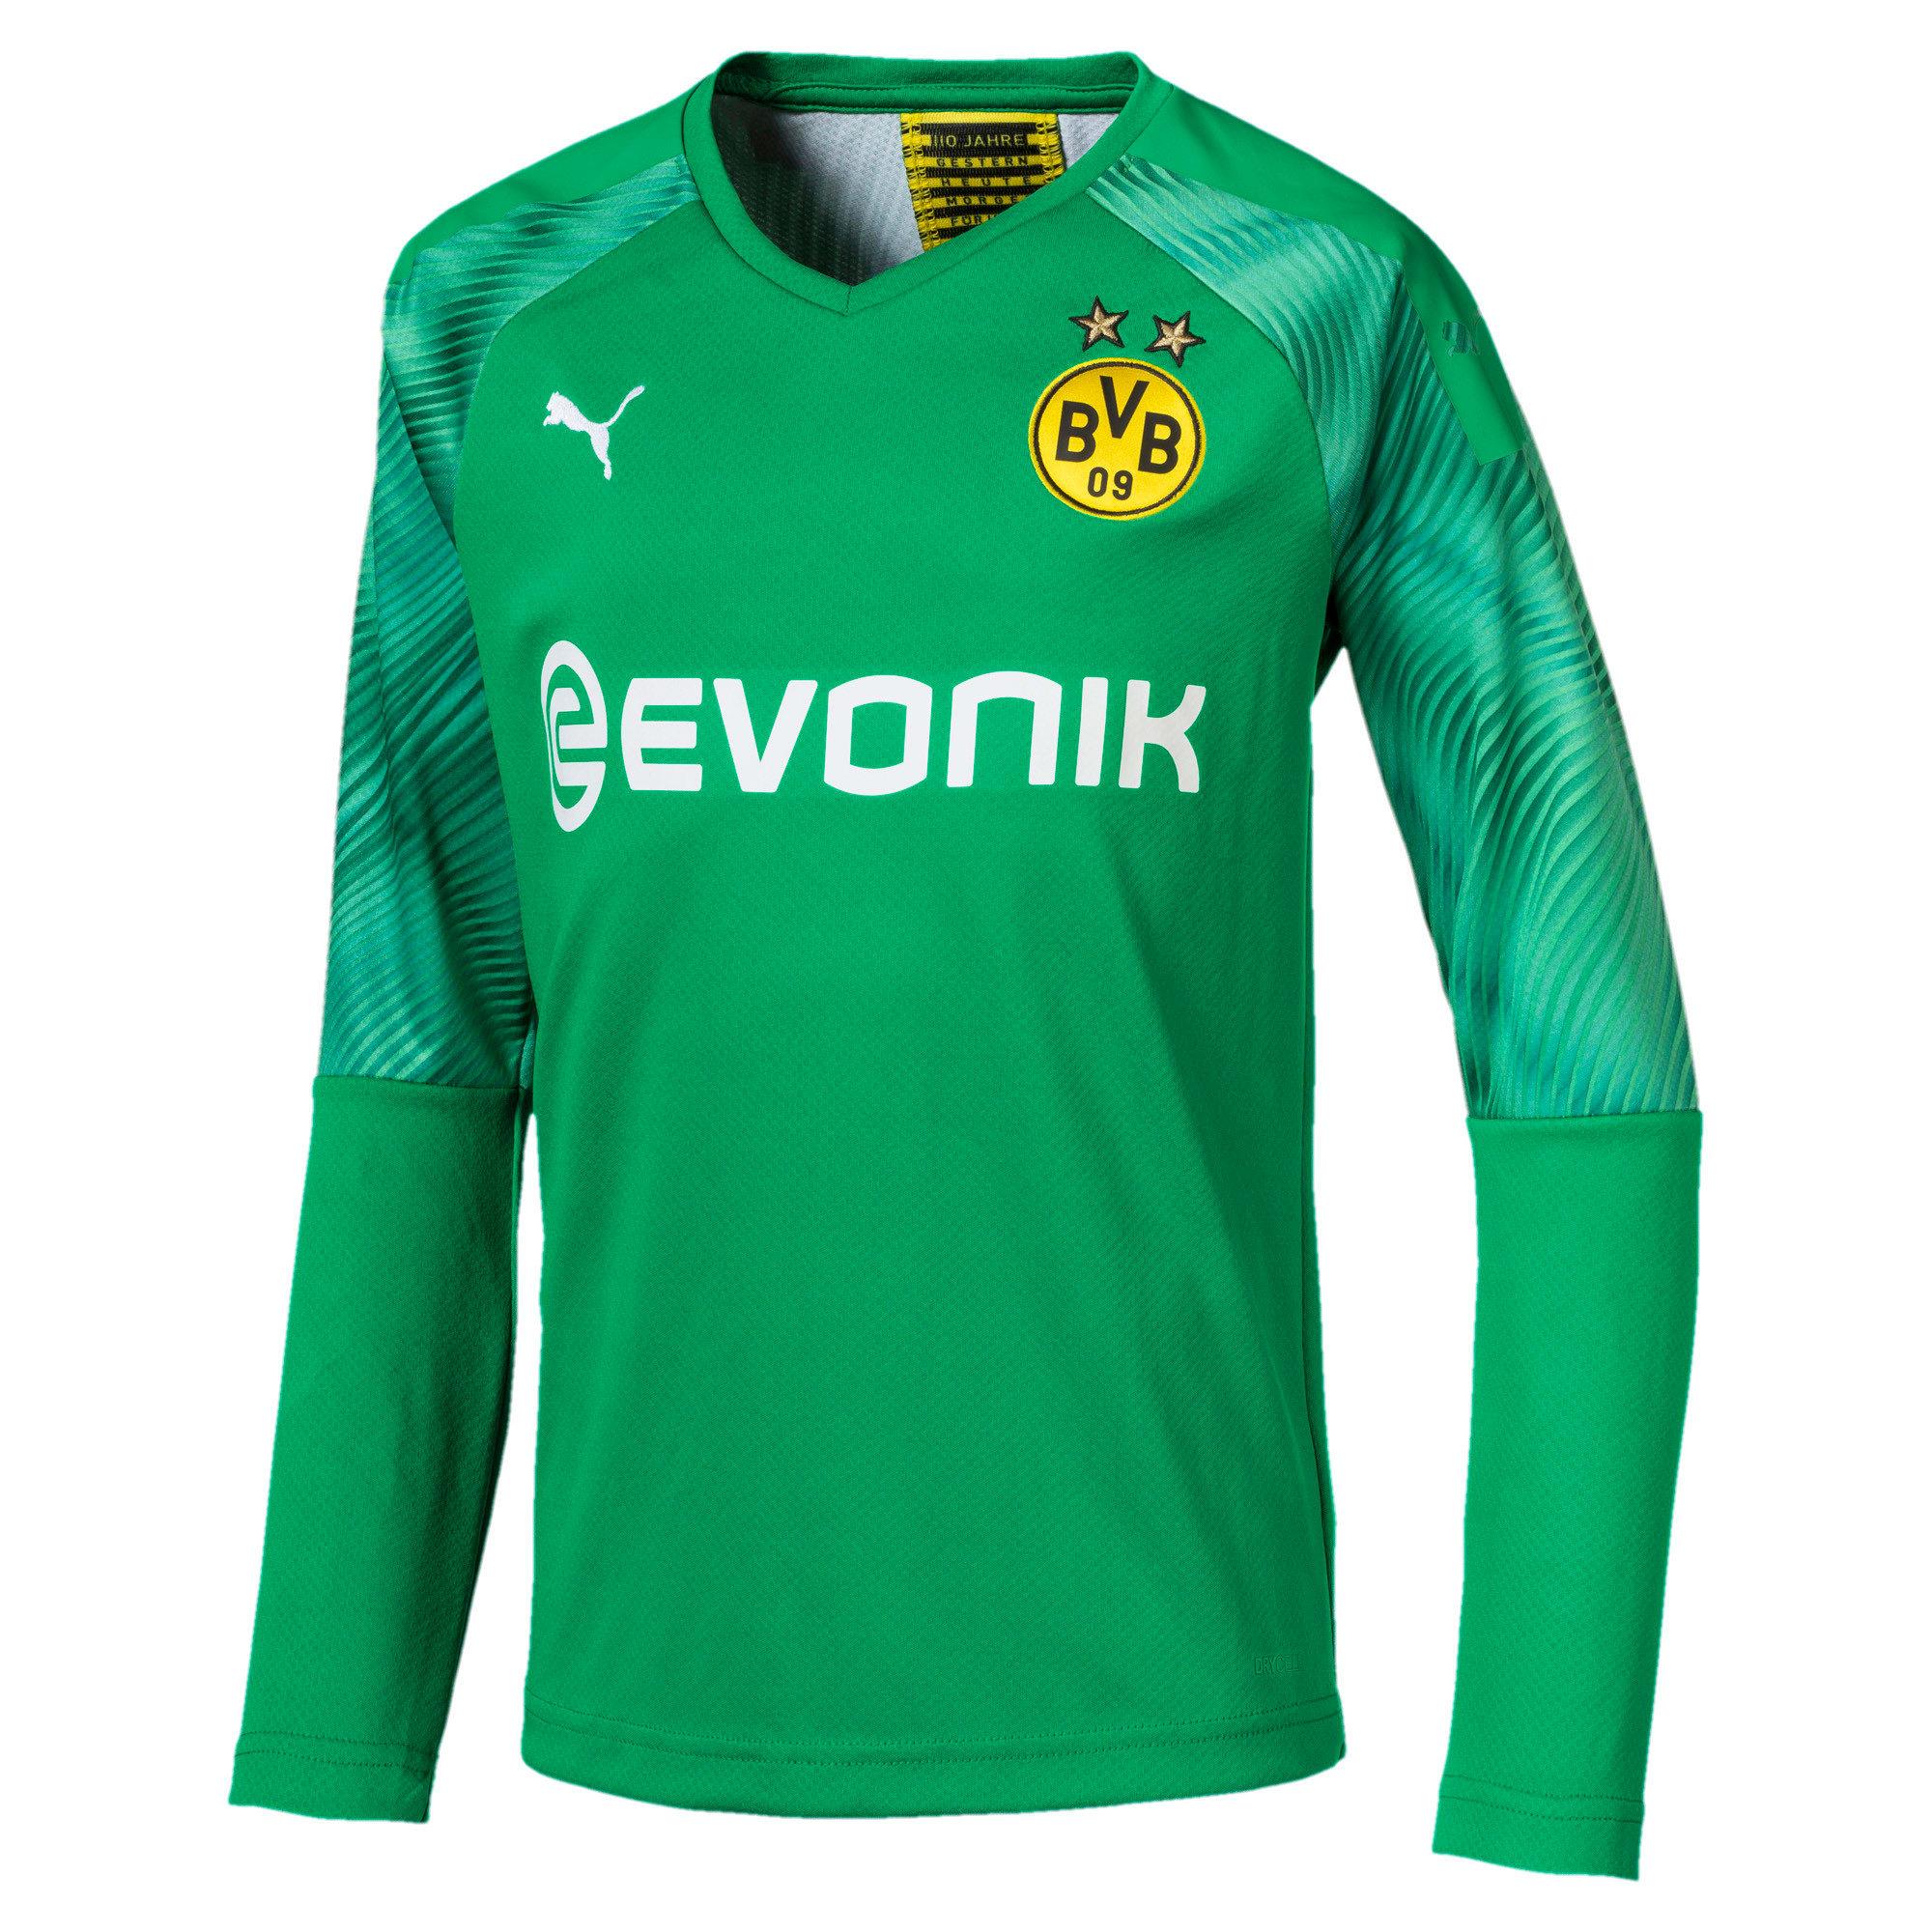 quality design 35ce3 185cb BVB Boys' Replica Goalkeeper Jersey